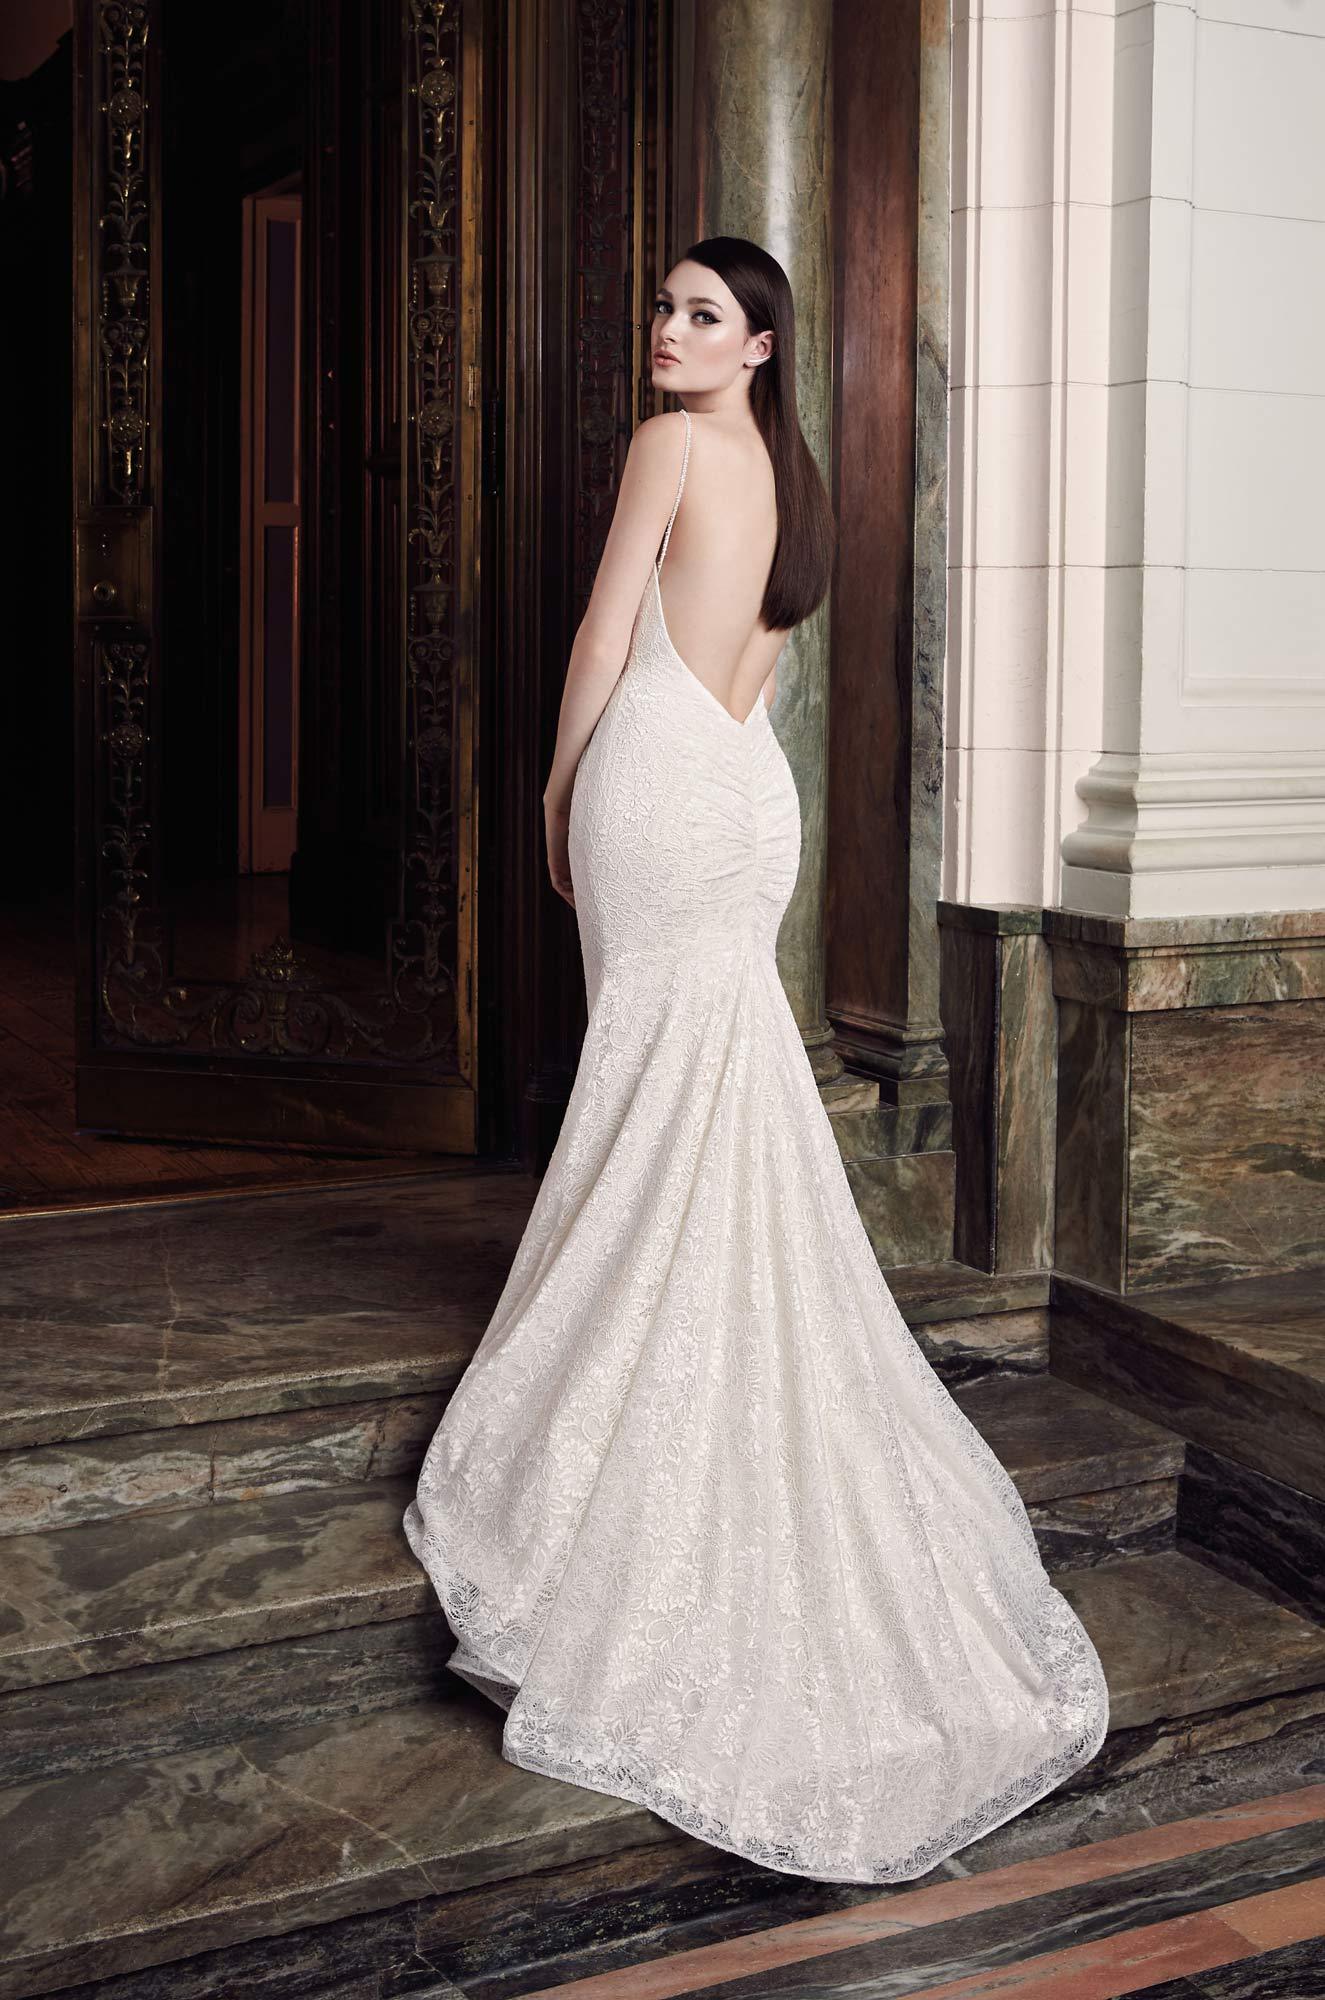 Fullsize Of Wedding Dress Rental